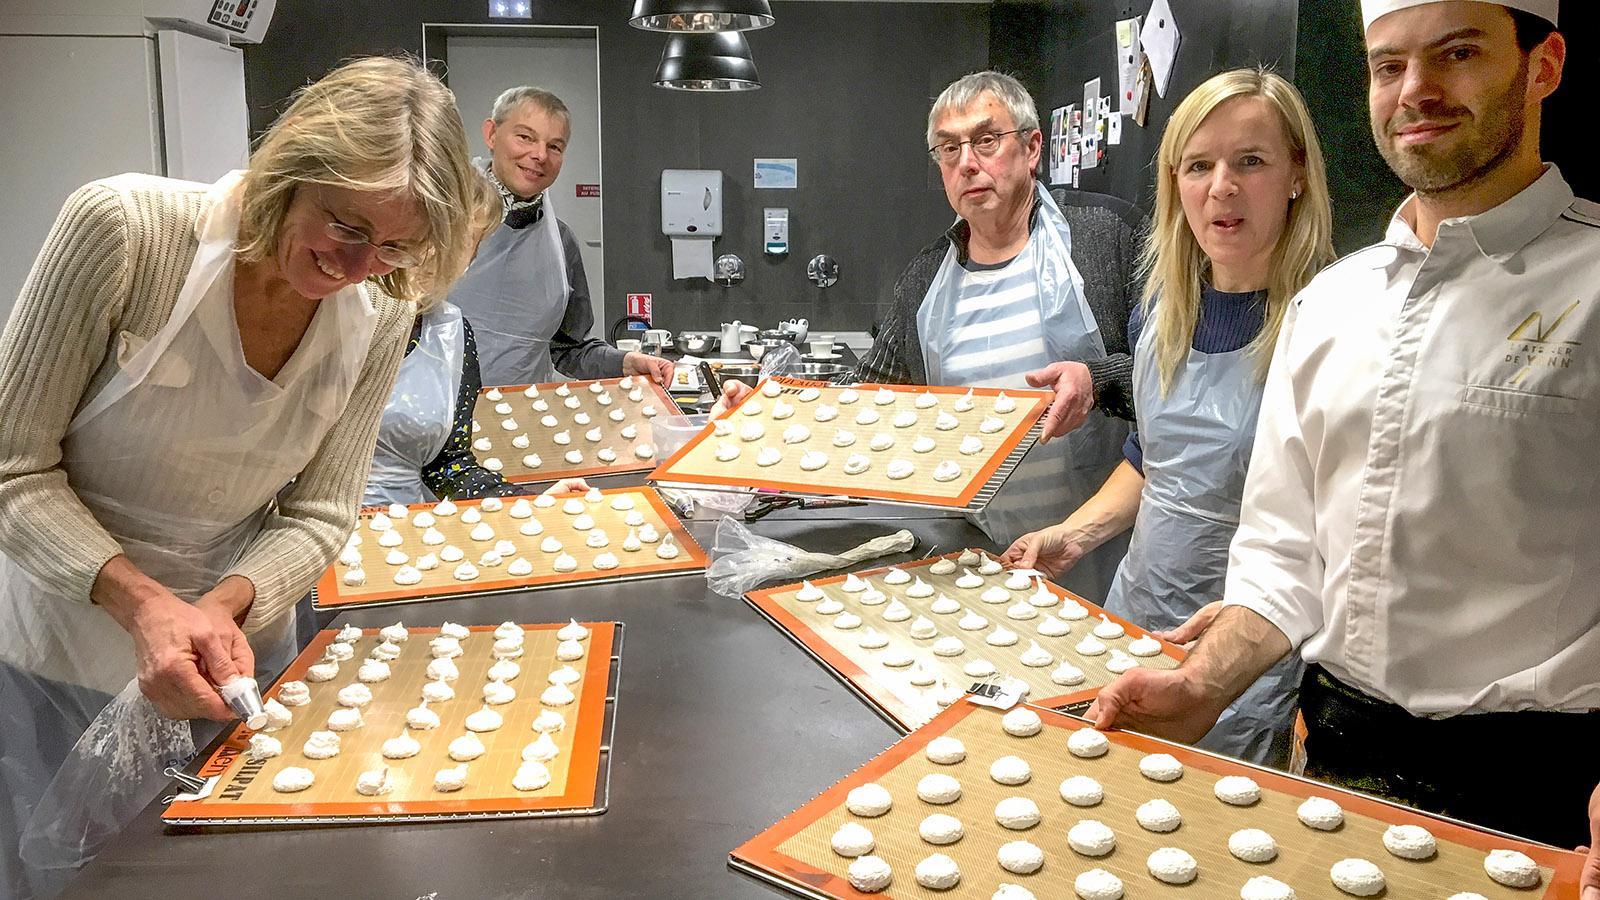 Wie Macarons gelinken, verrät Yann in seinem Atelier bei Backkursen. Foto: Hilke Maunder